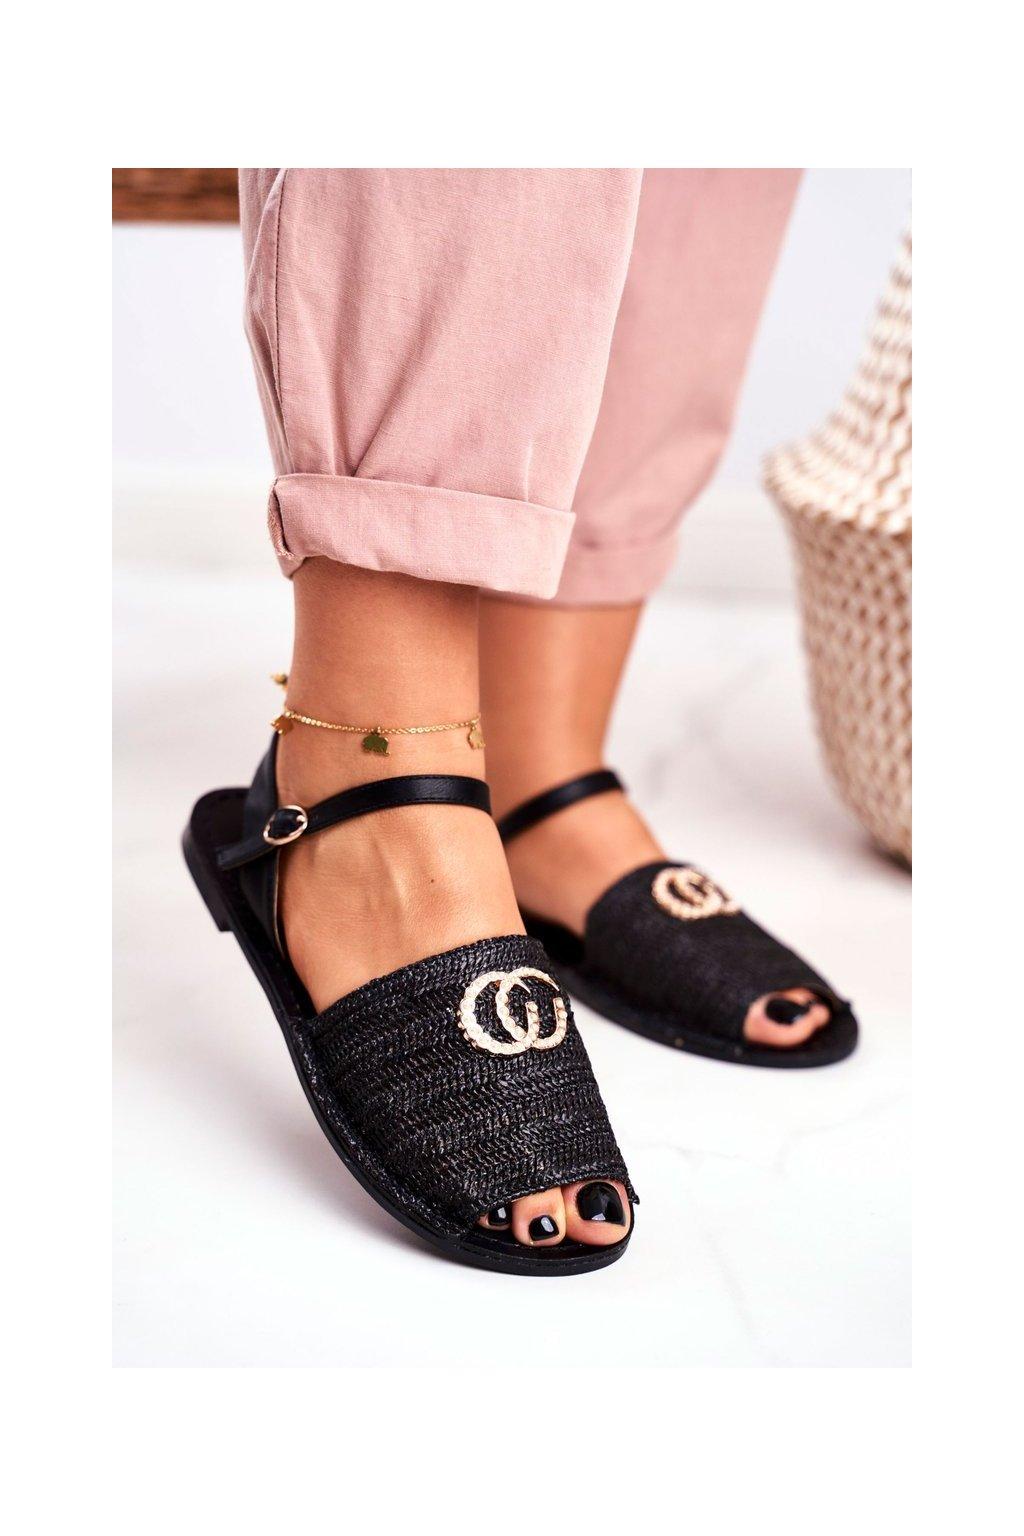 Dámske sandále s plochou podrážkou farba čierna kód obuvi 108-B8 BLK